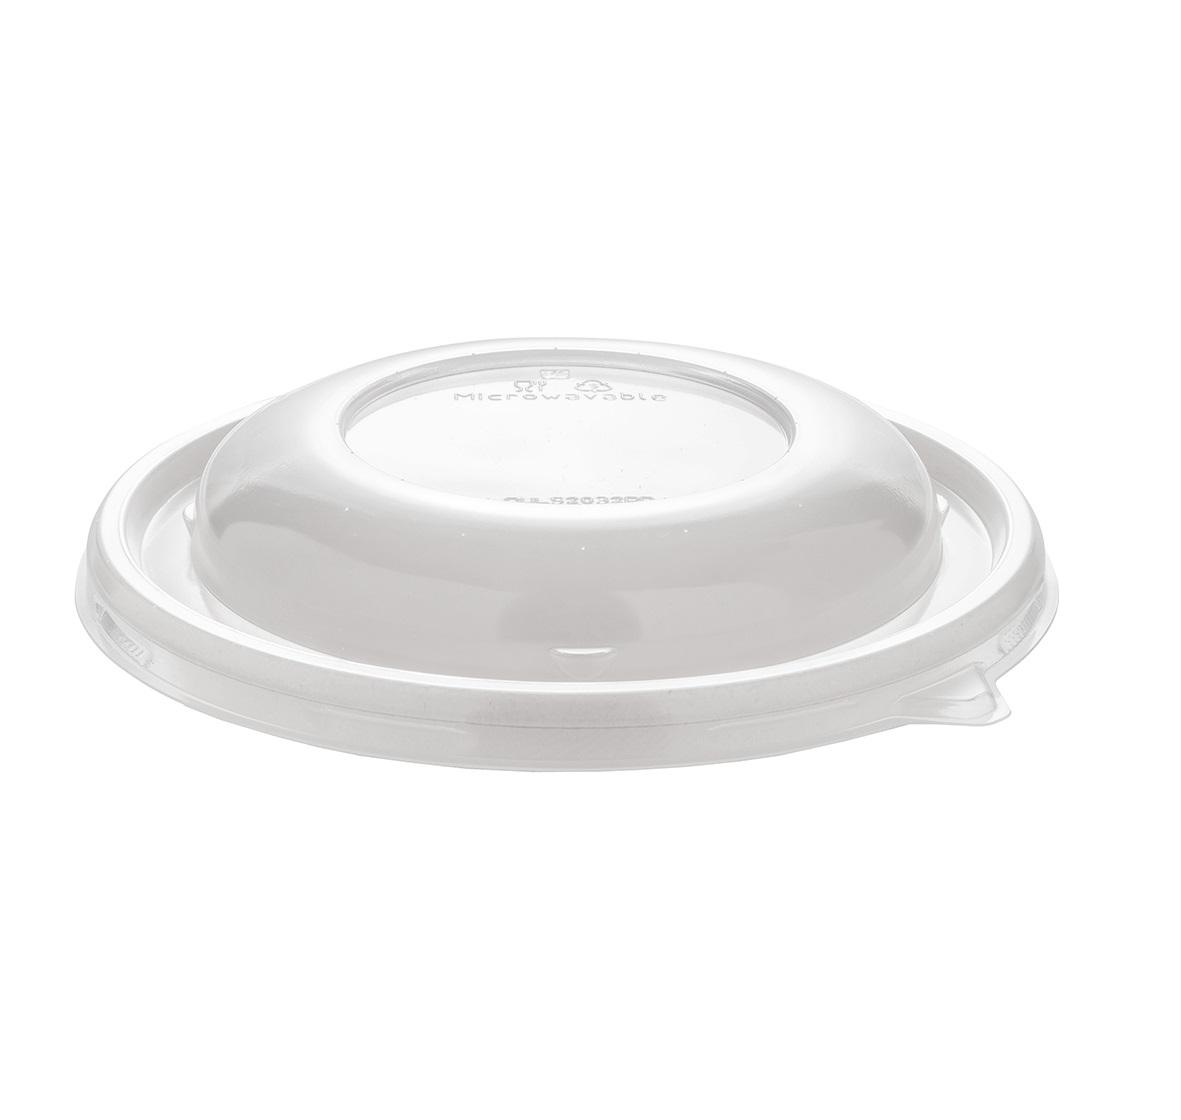 Domed PP deksel voor bowl 21cm Ø